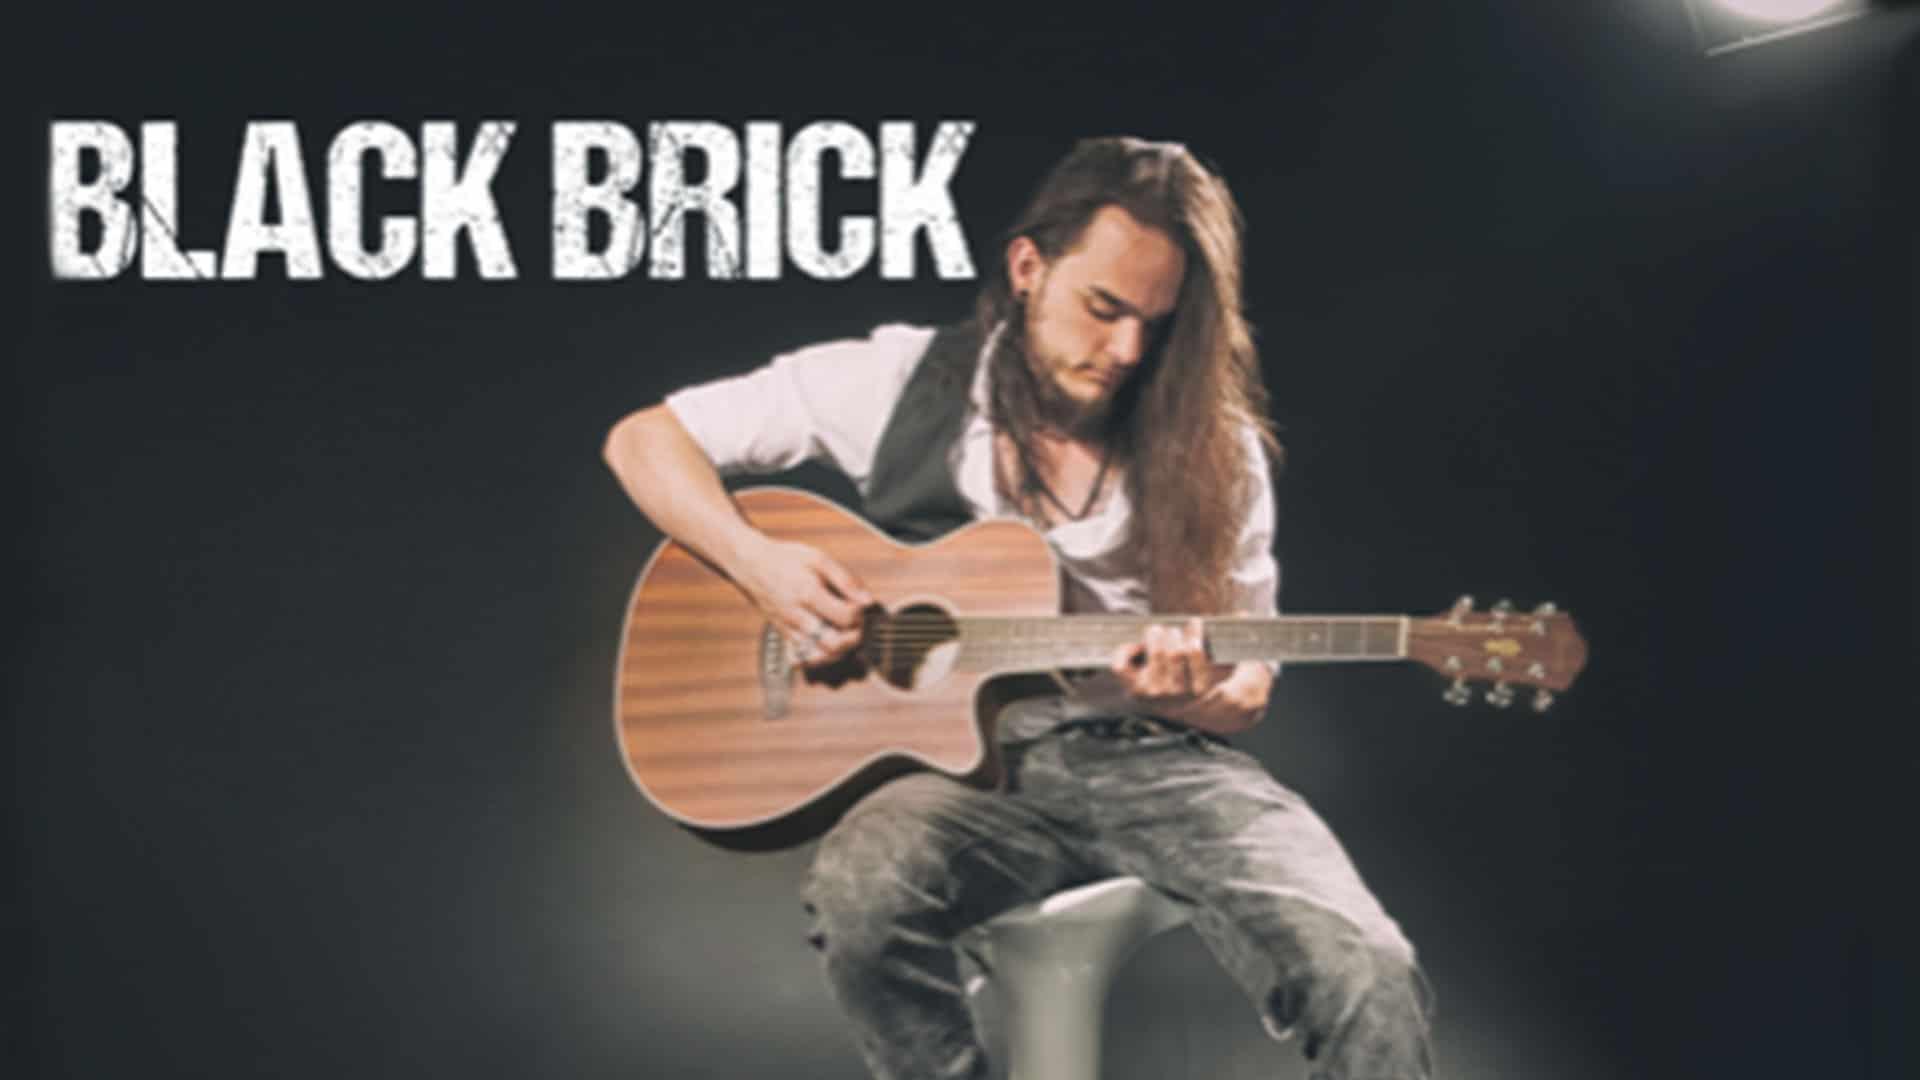 Live: Blackbrick (Acoustic Cover)